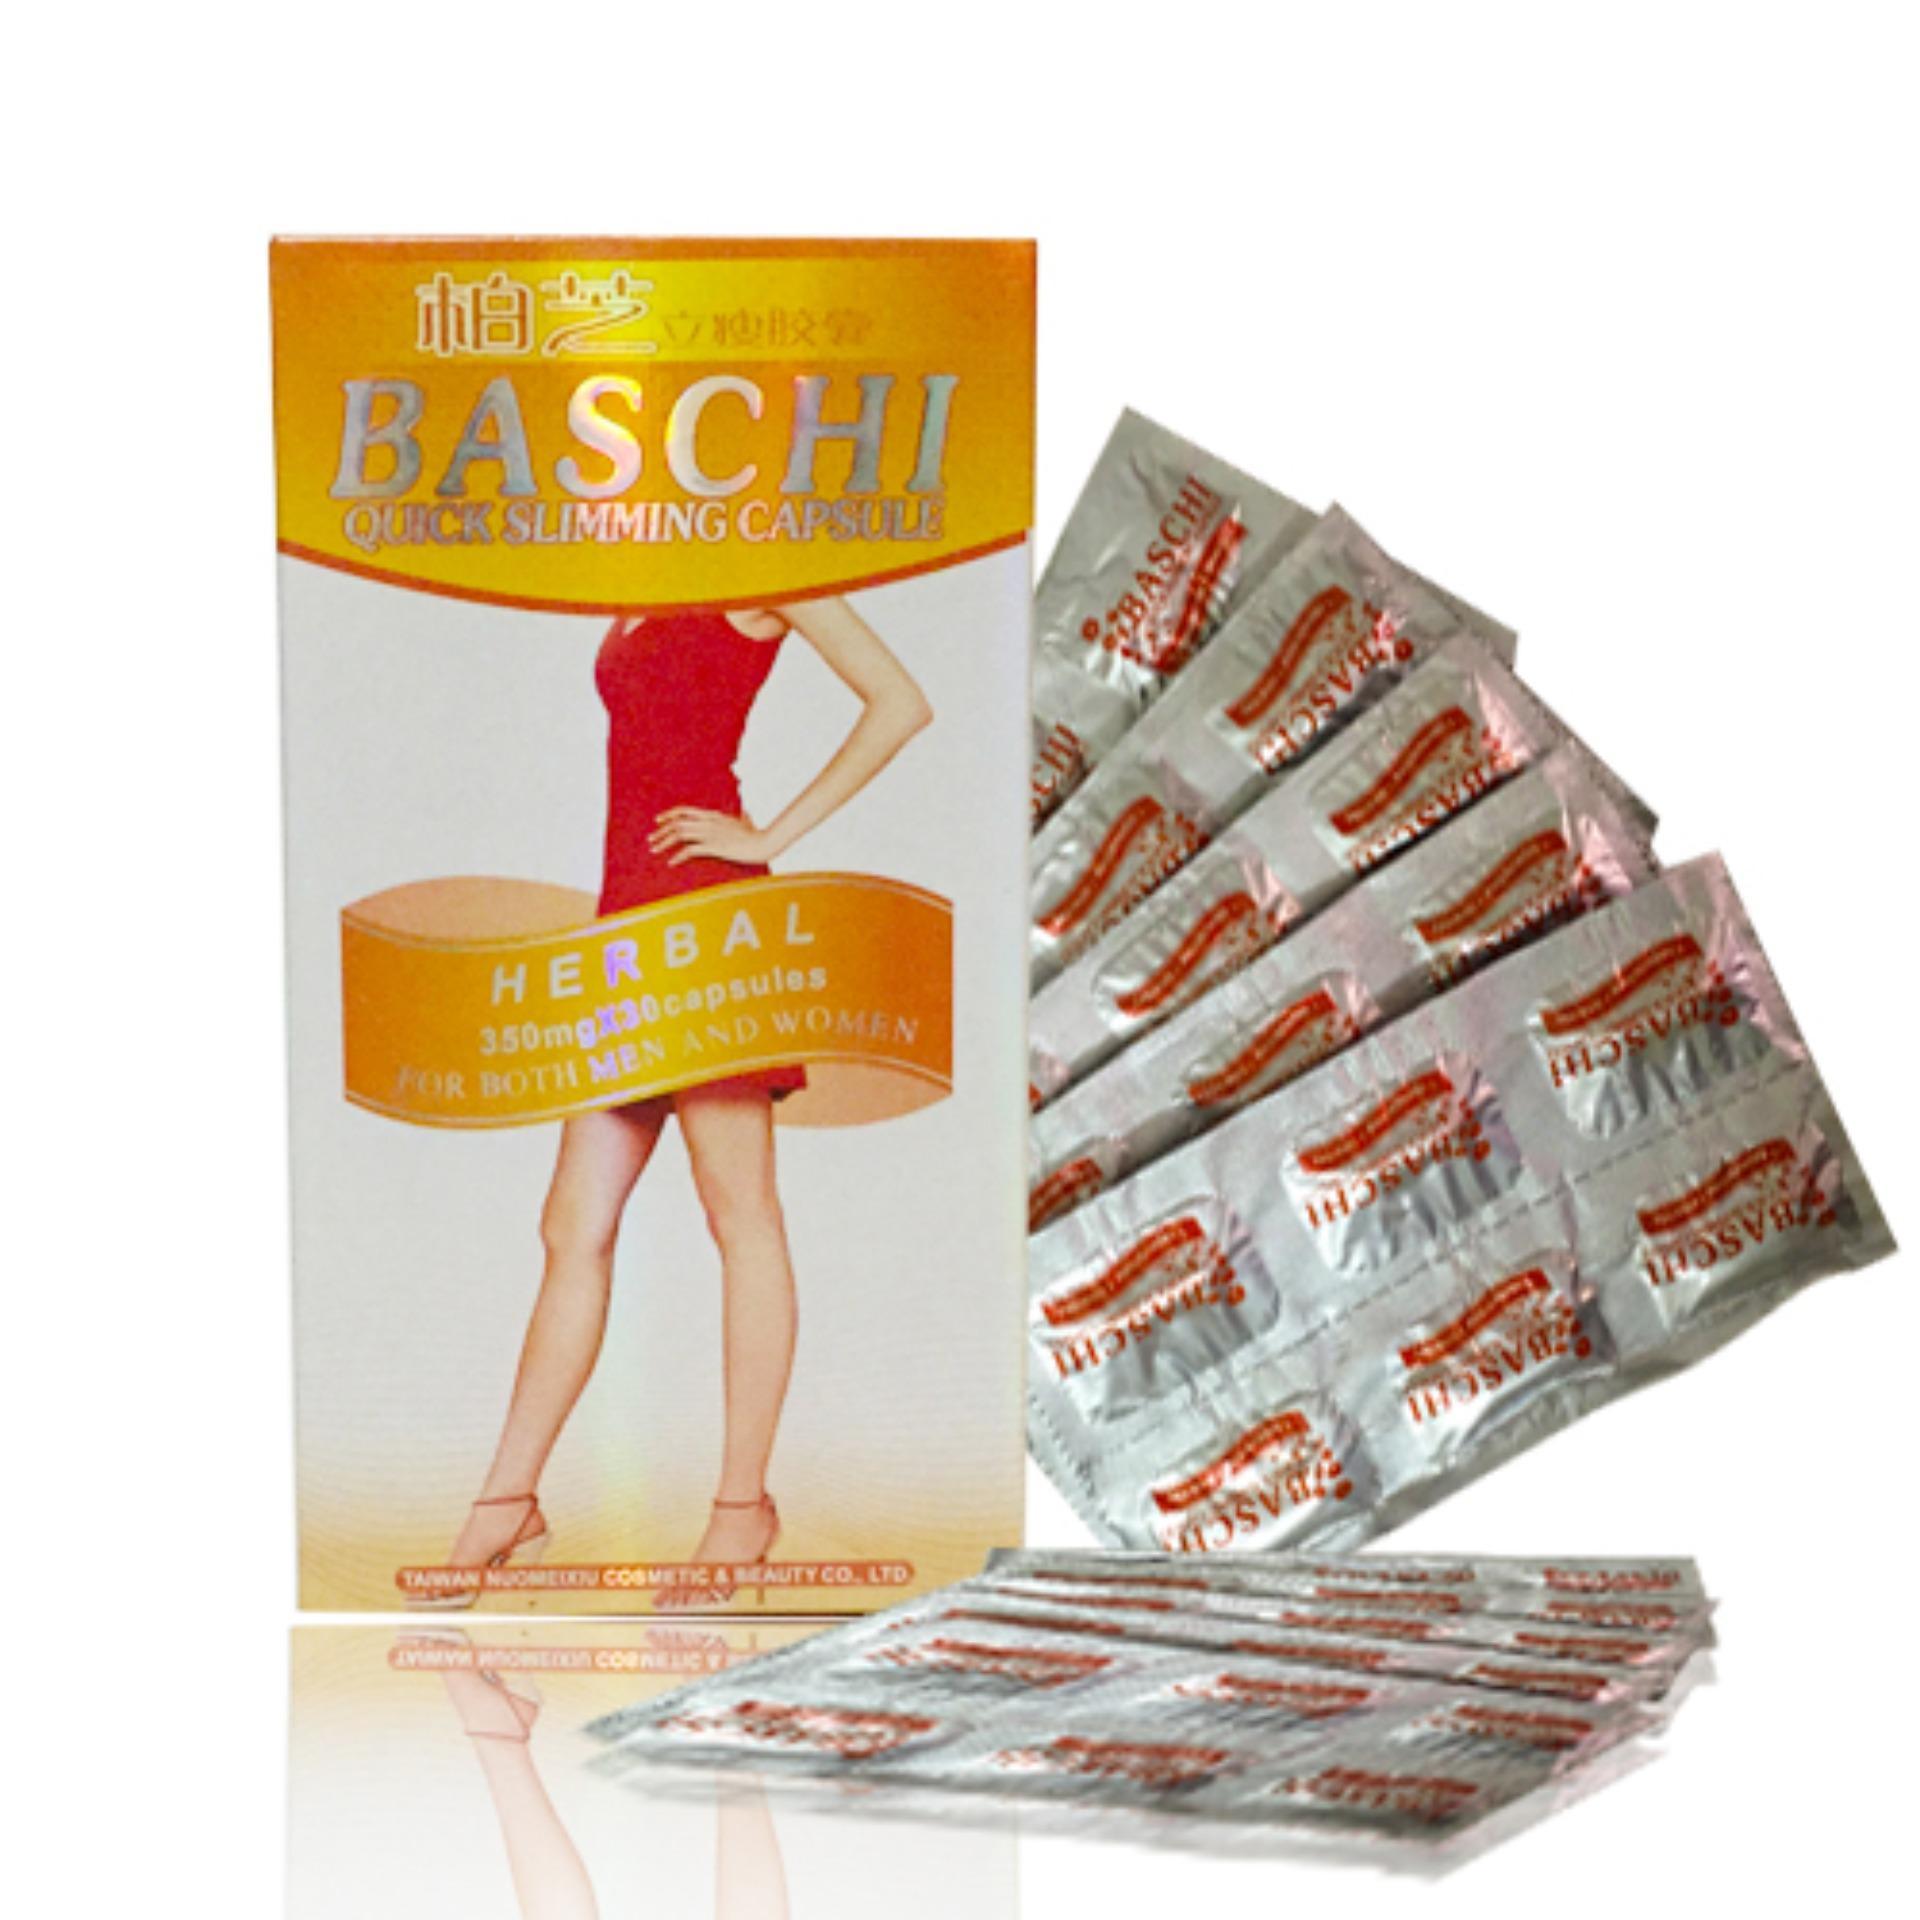 Thuốc giảm cân Baschi cam siêu giảm cân an toàn (30 viên)